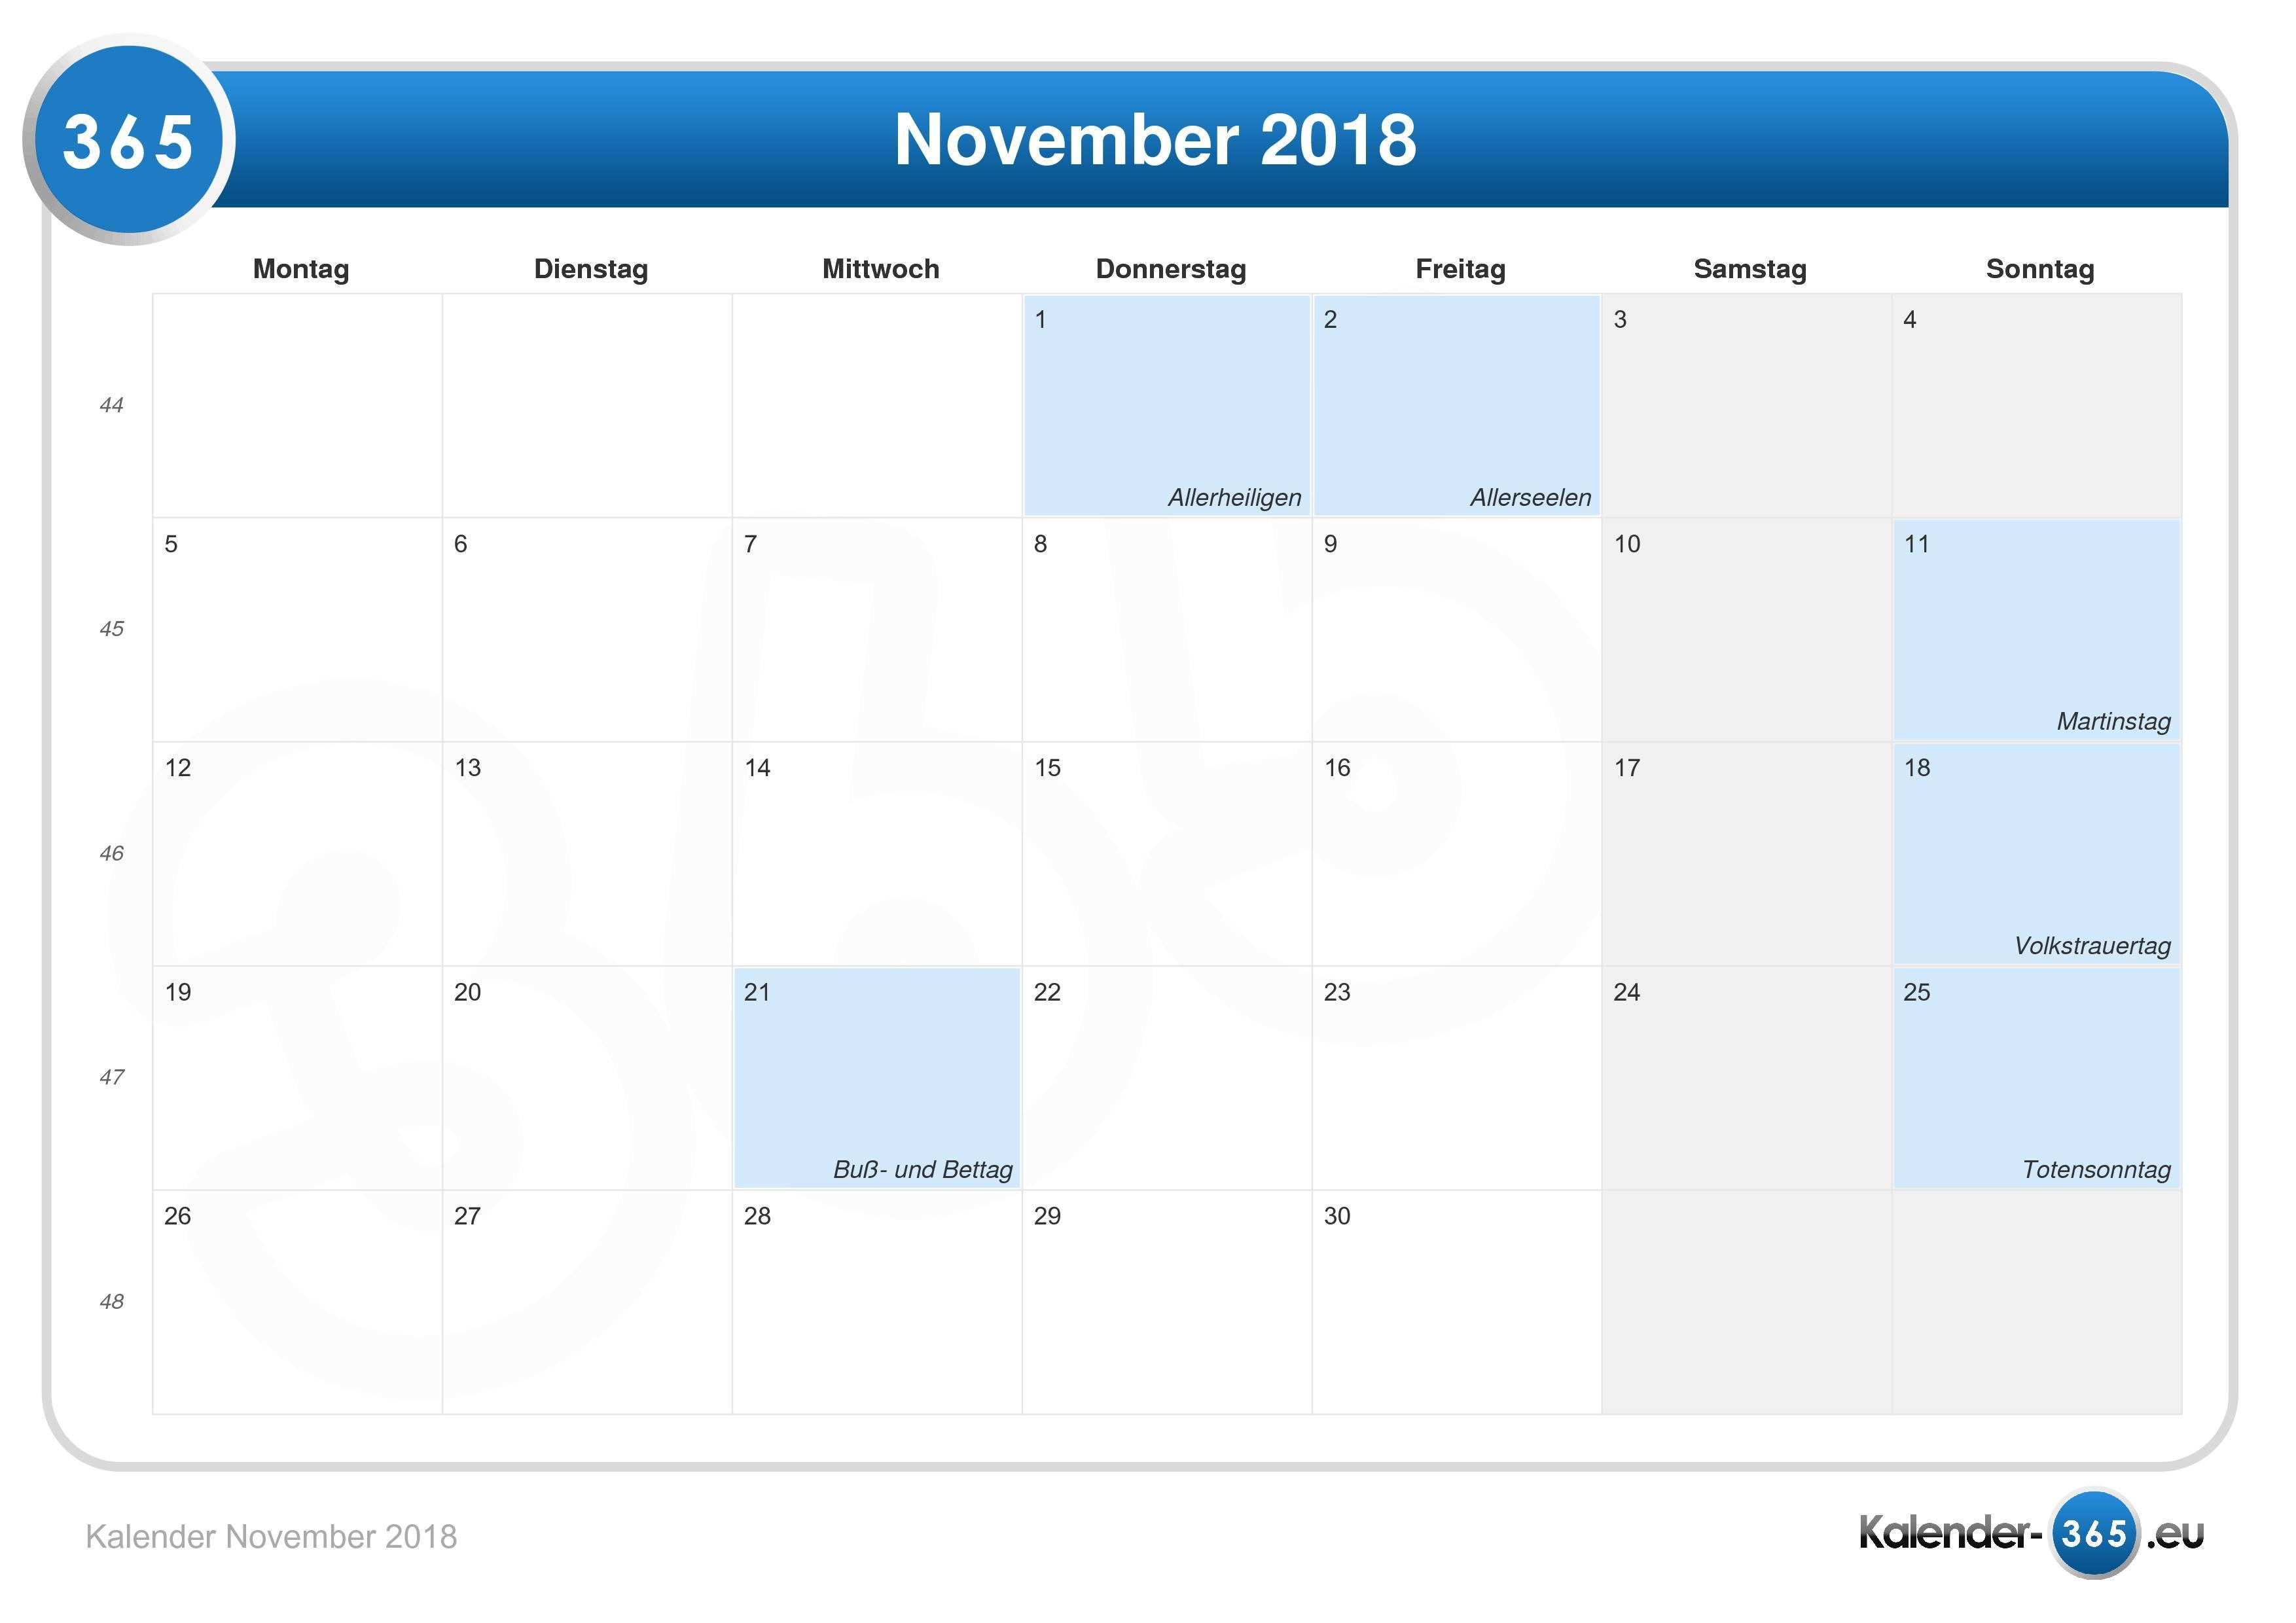 Kalender November 2018